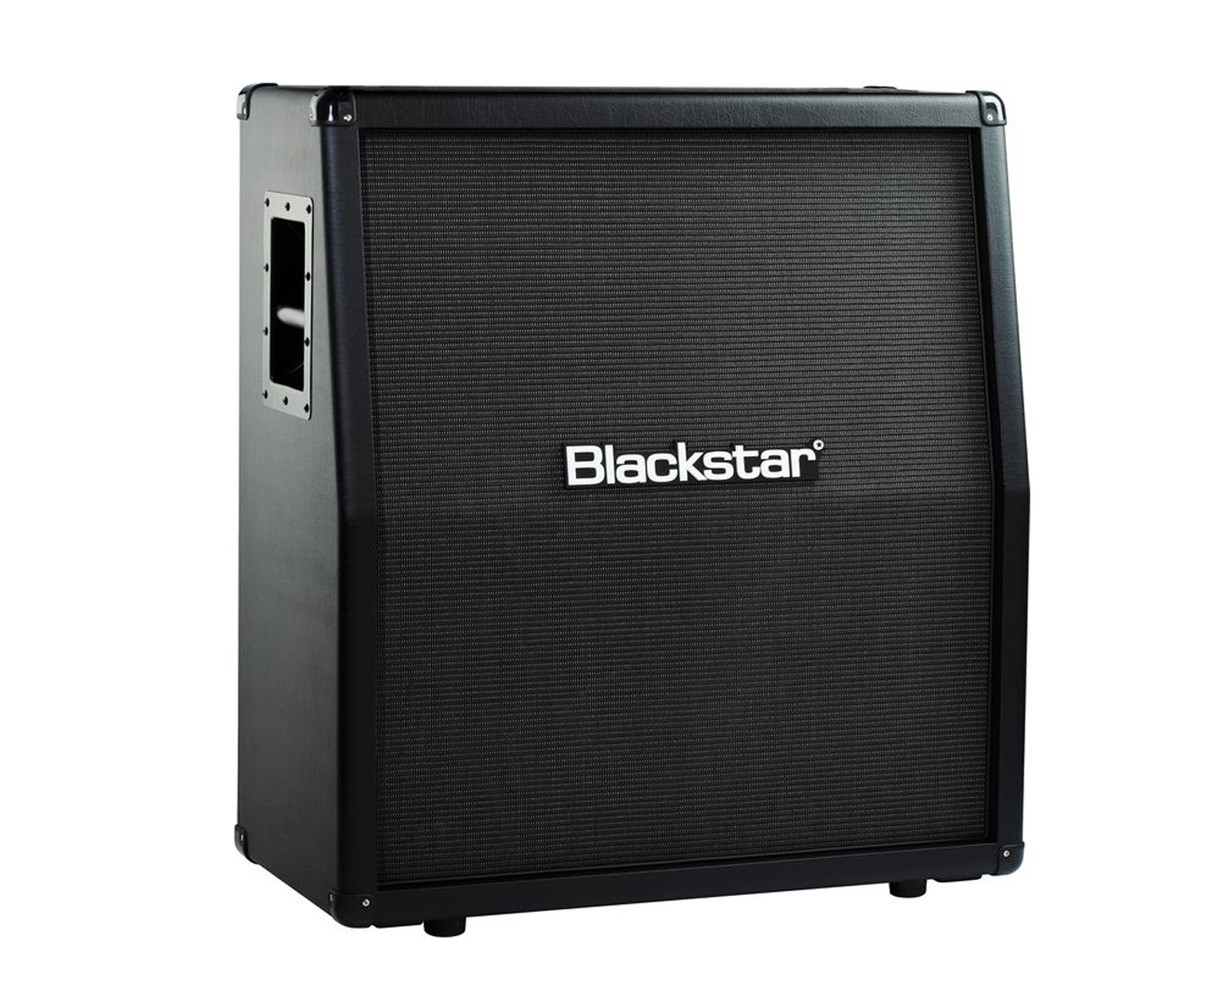 Blackstar Series One 4x12 Speaker Cabinet